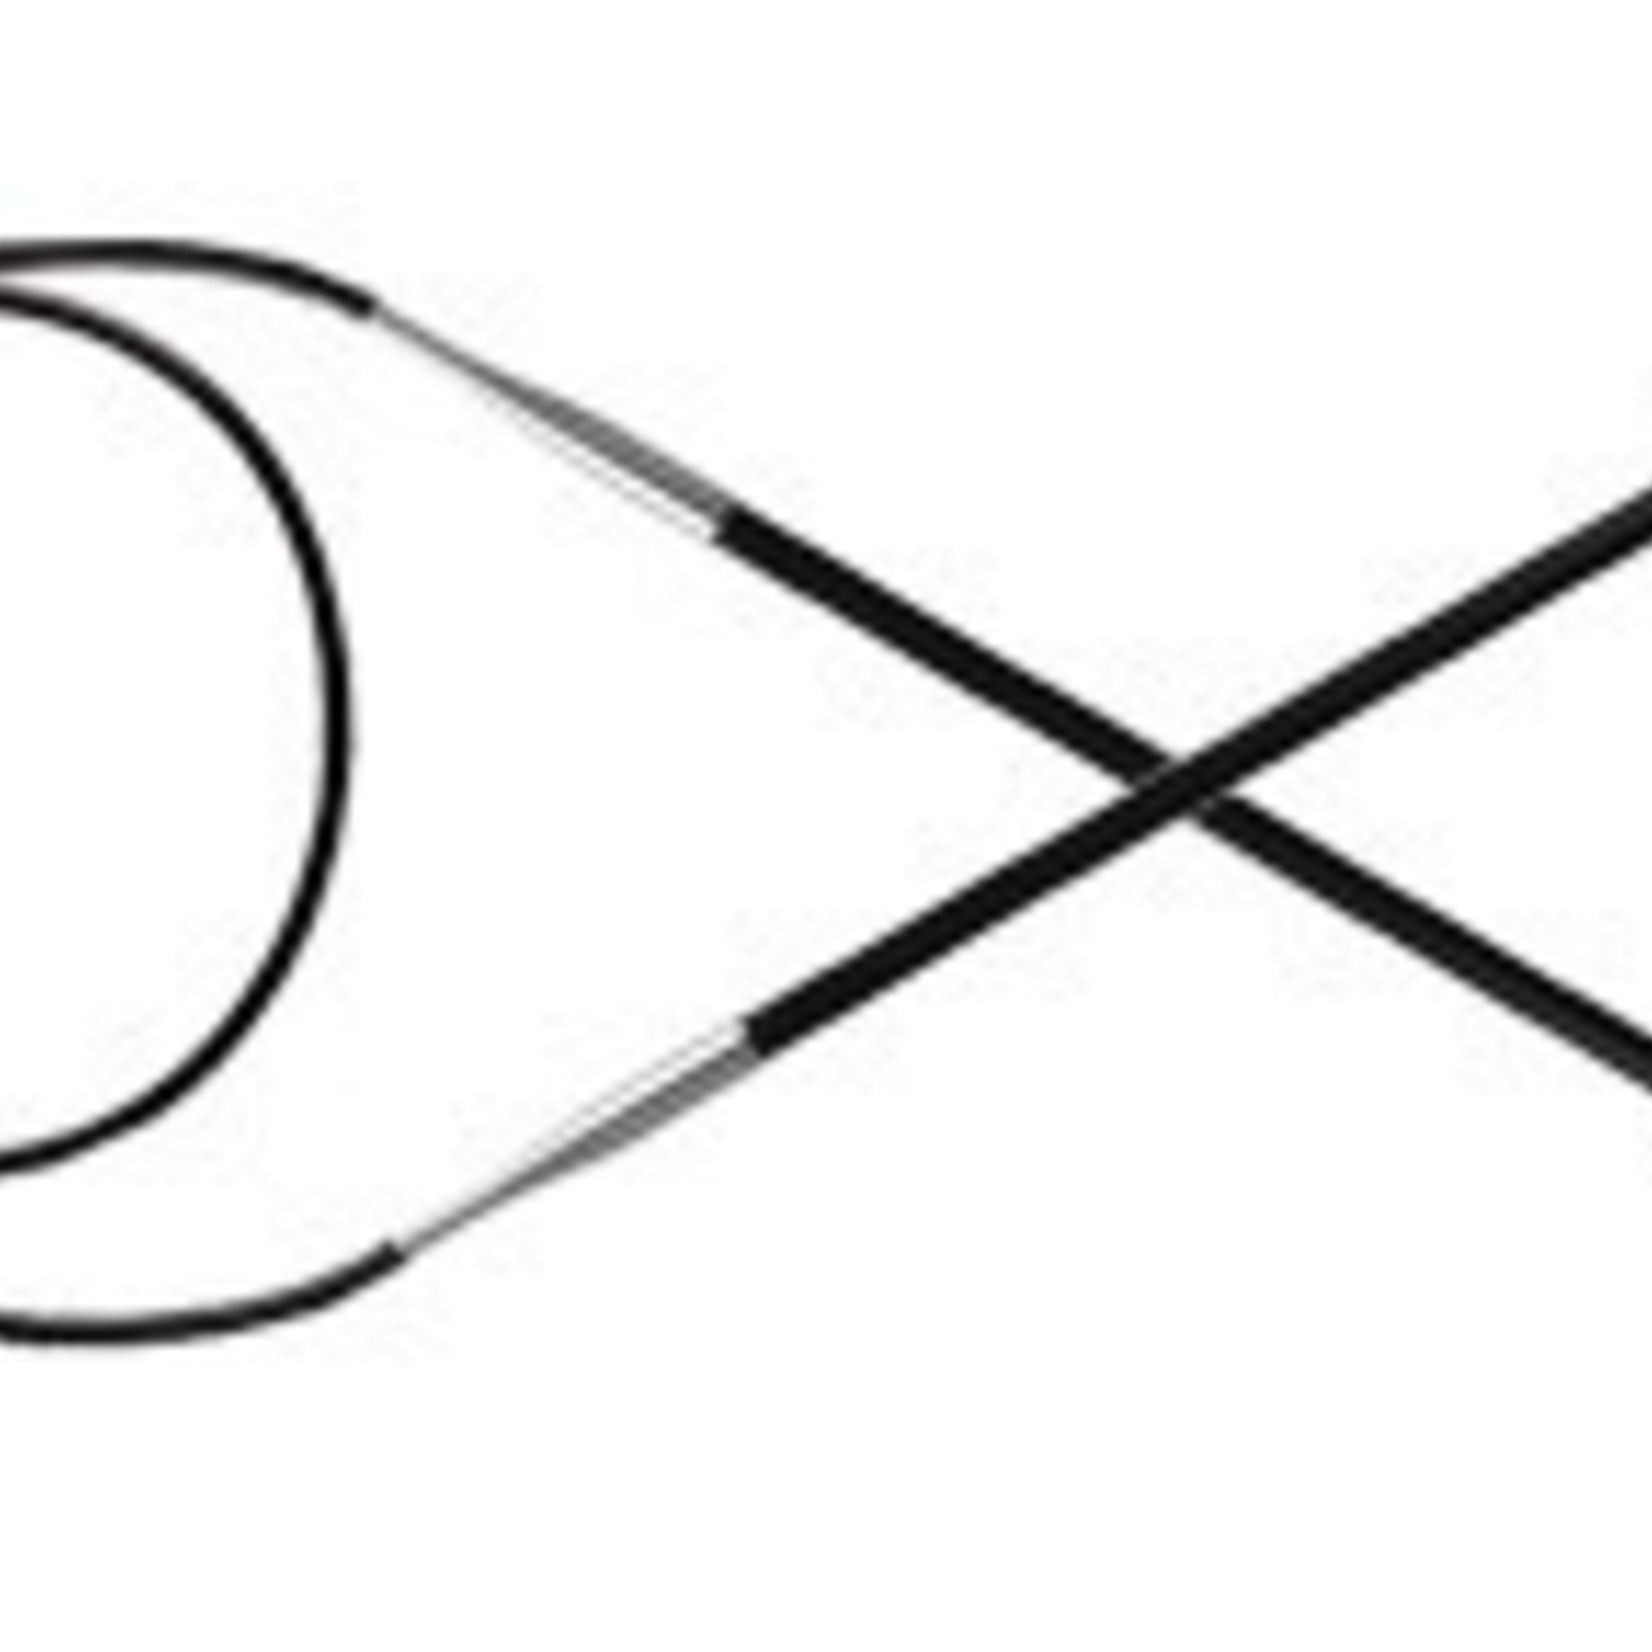 Knitter's Pride 7 Karbonz Circular 16